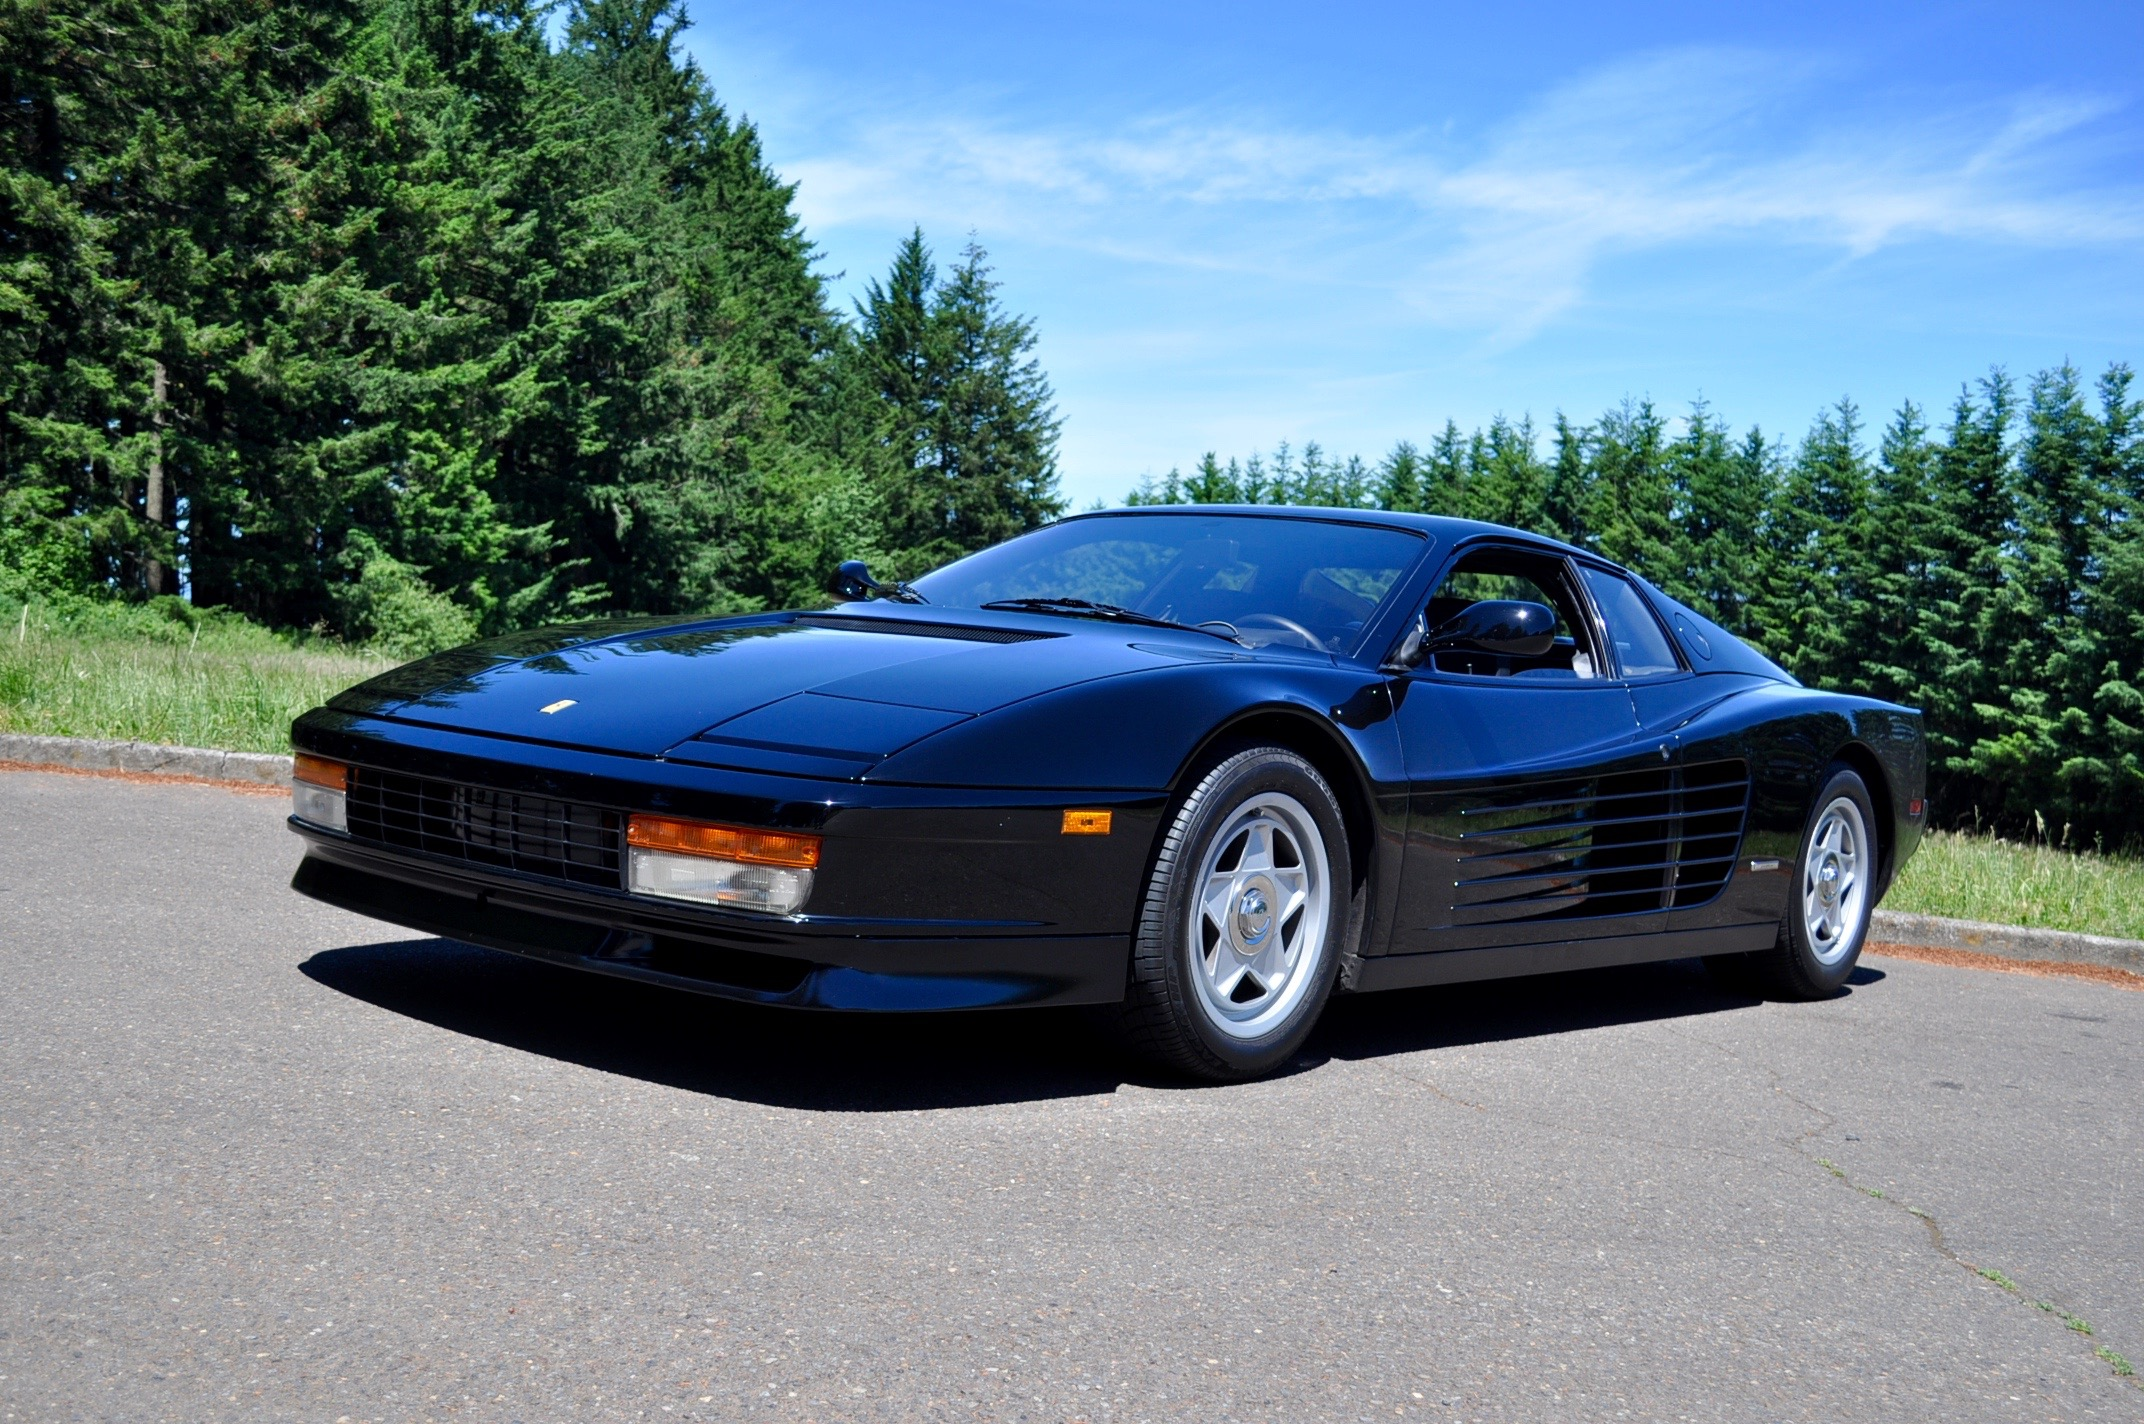 1988 Ferrari Testarossa Time Machine Test Drive